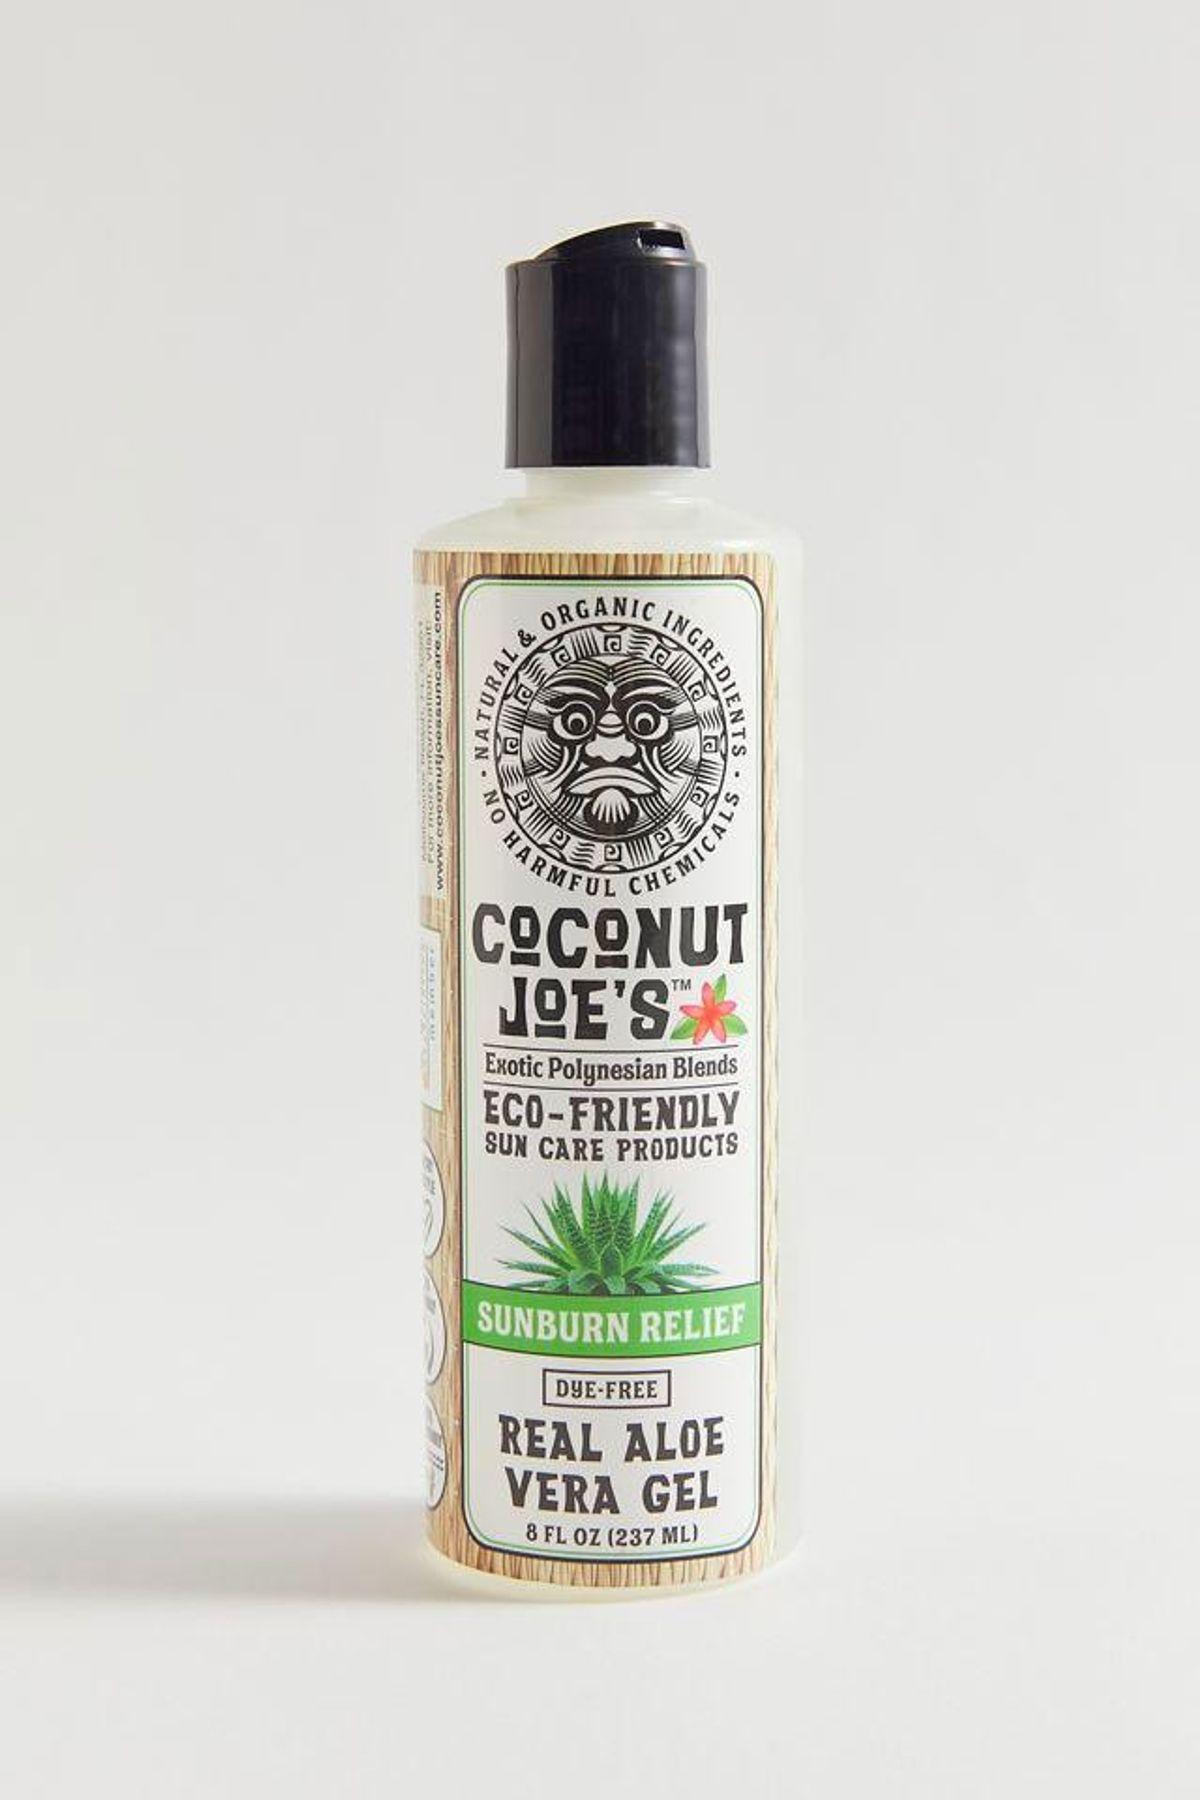 coconut joes sunburn relief real aloe vera gel